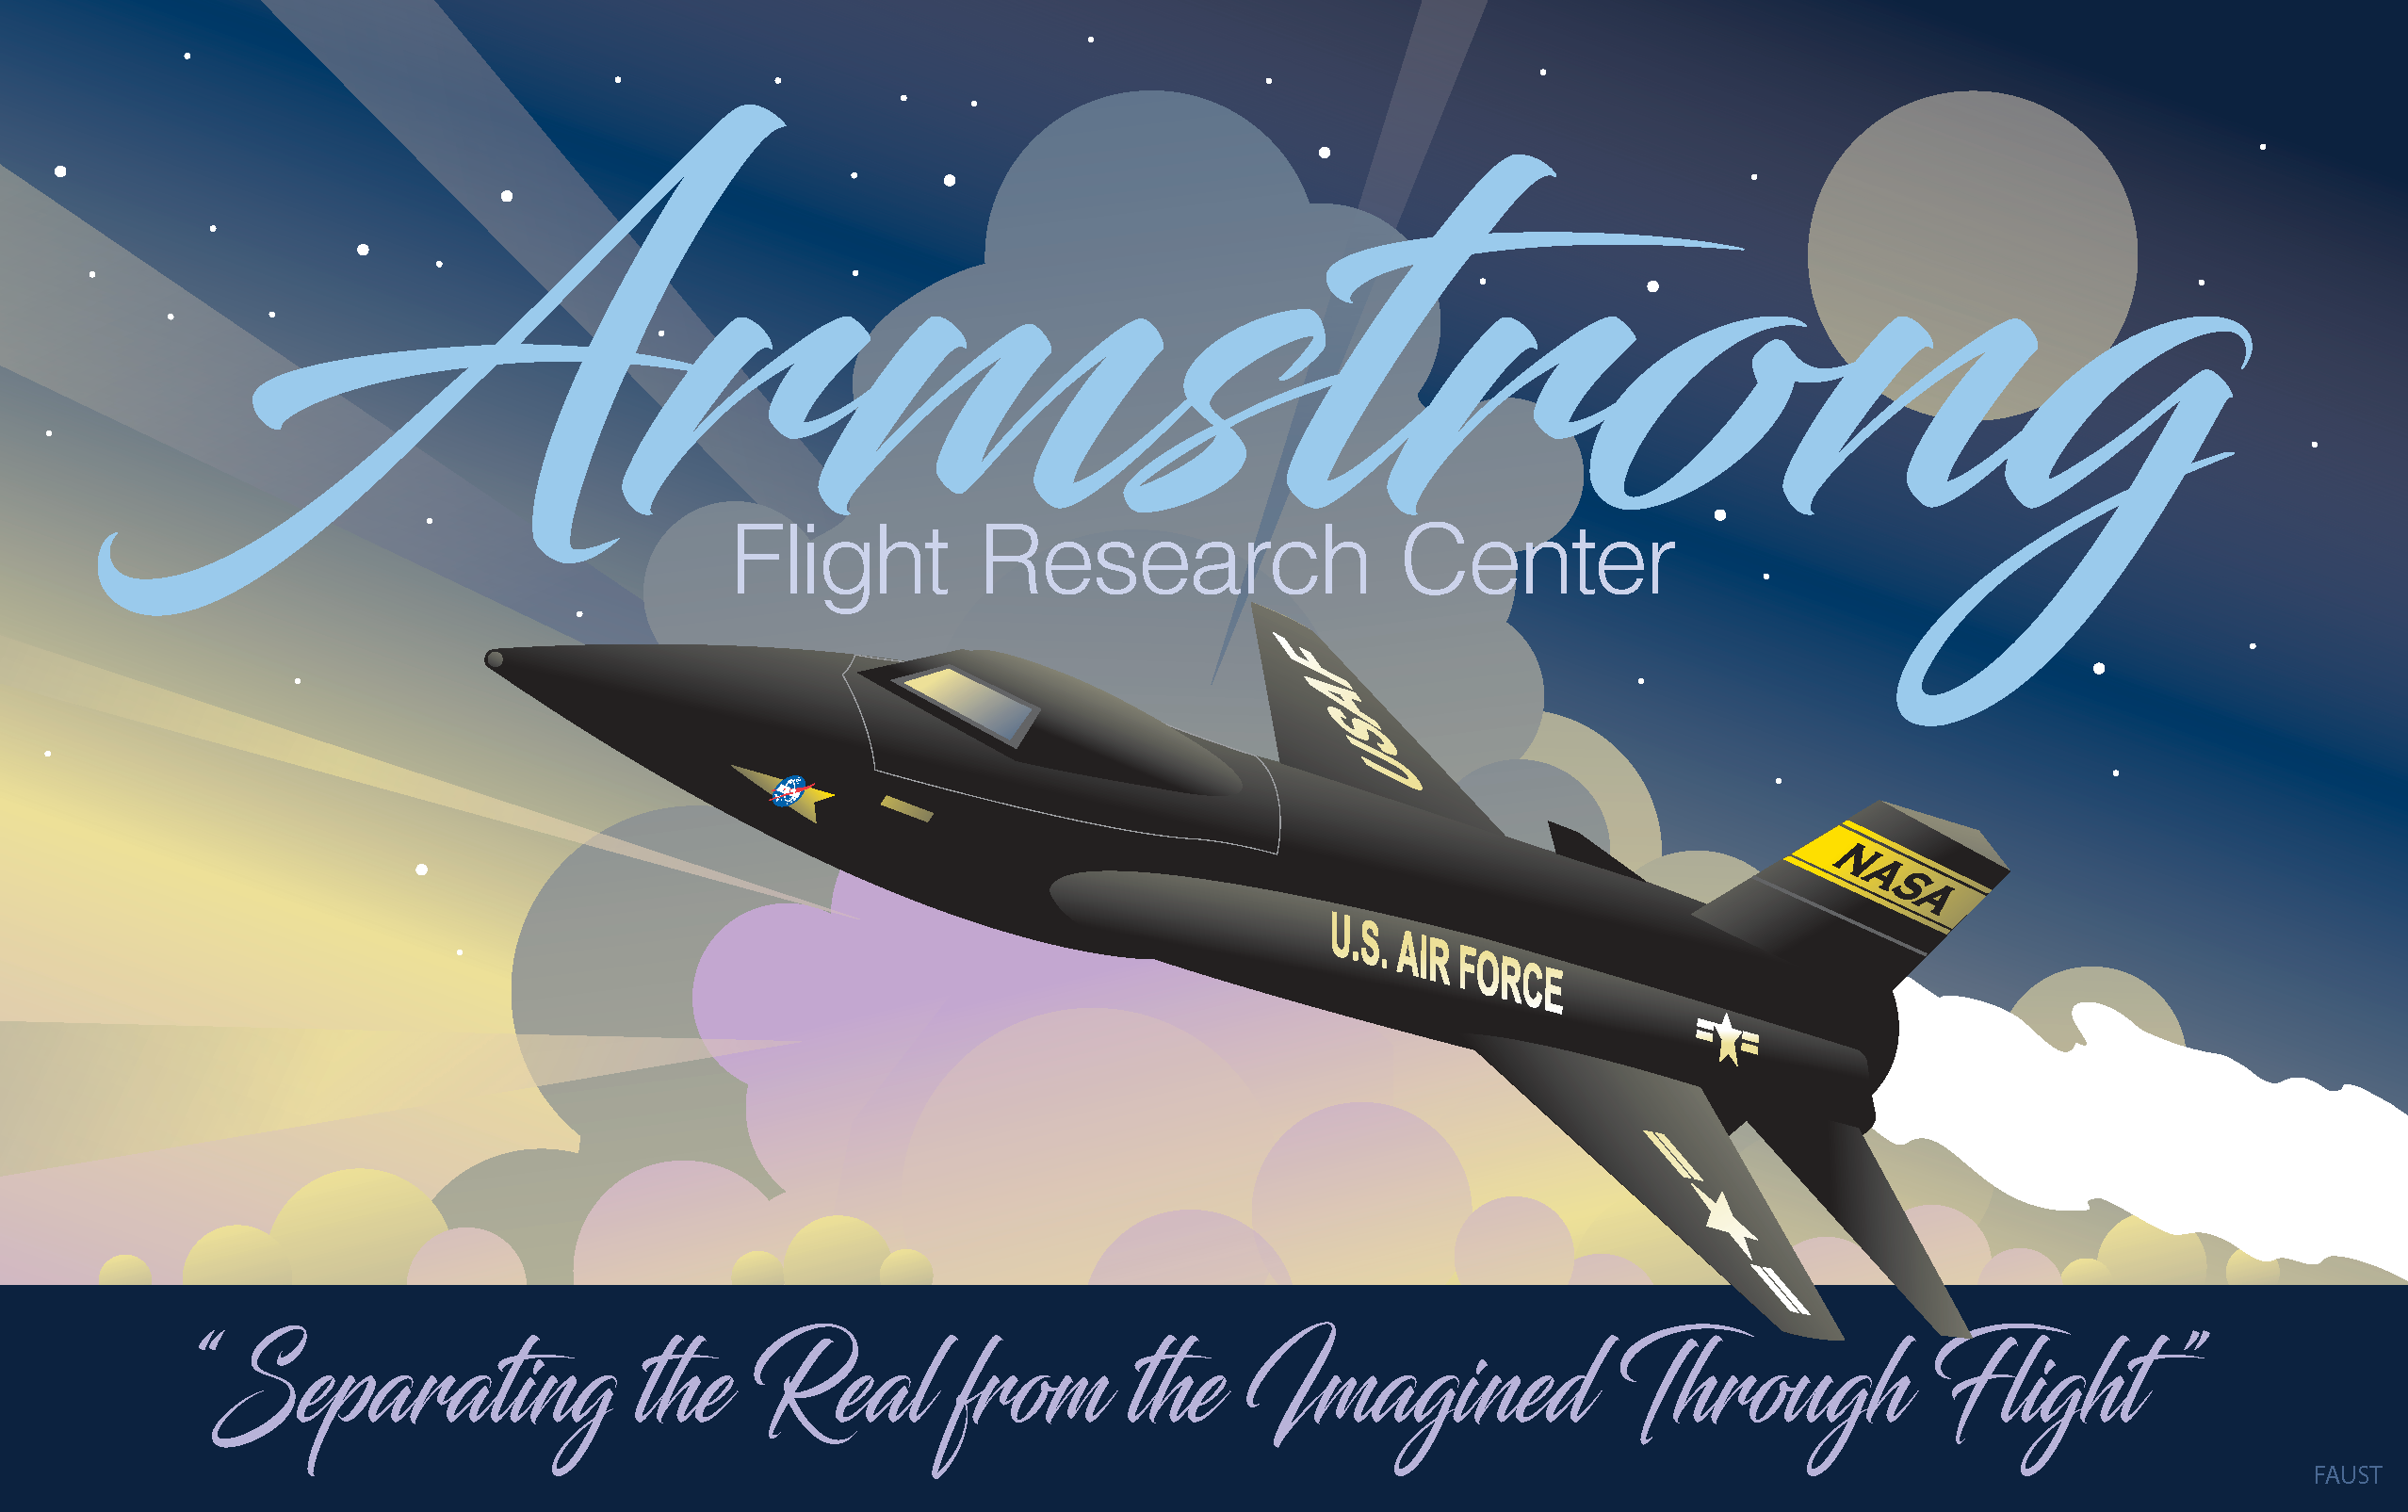 hypersonic flight nasa - photo #23